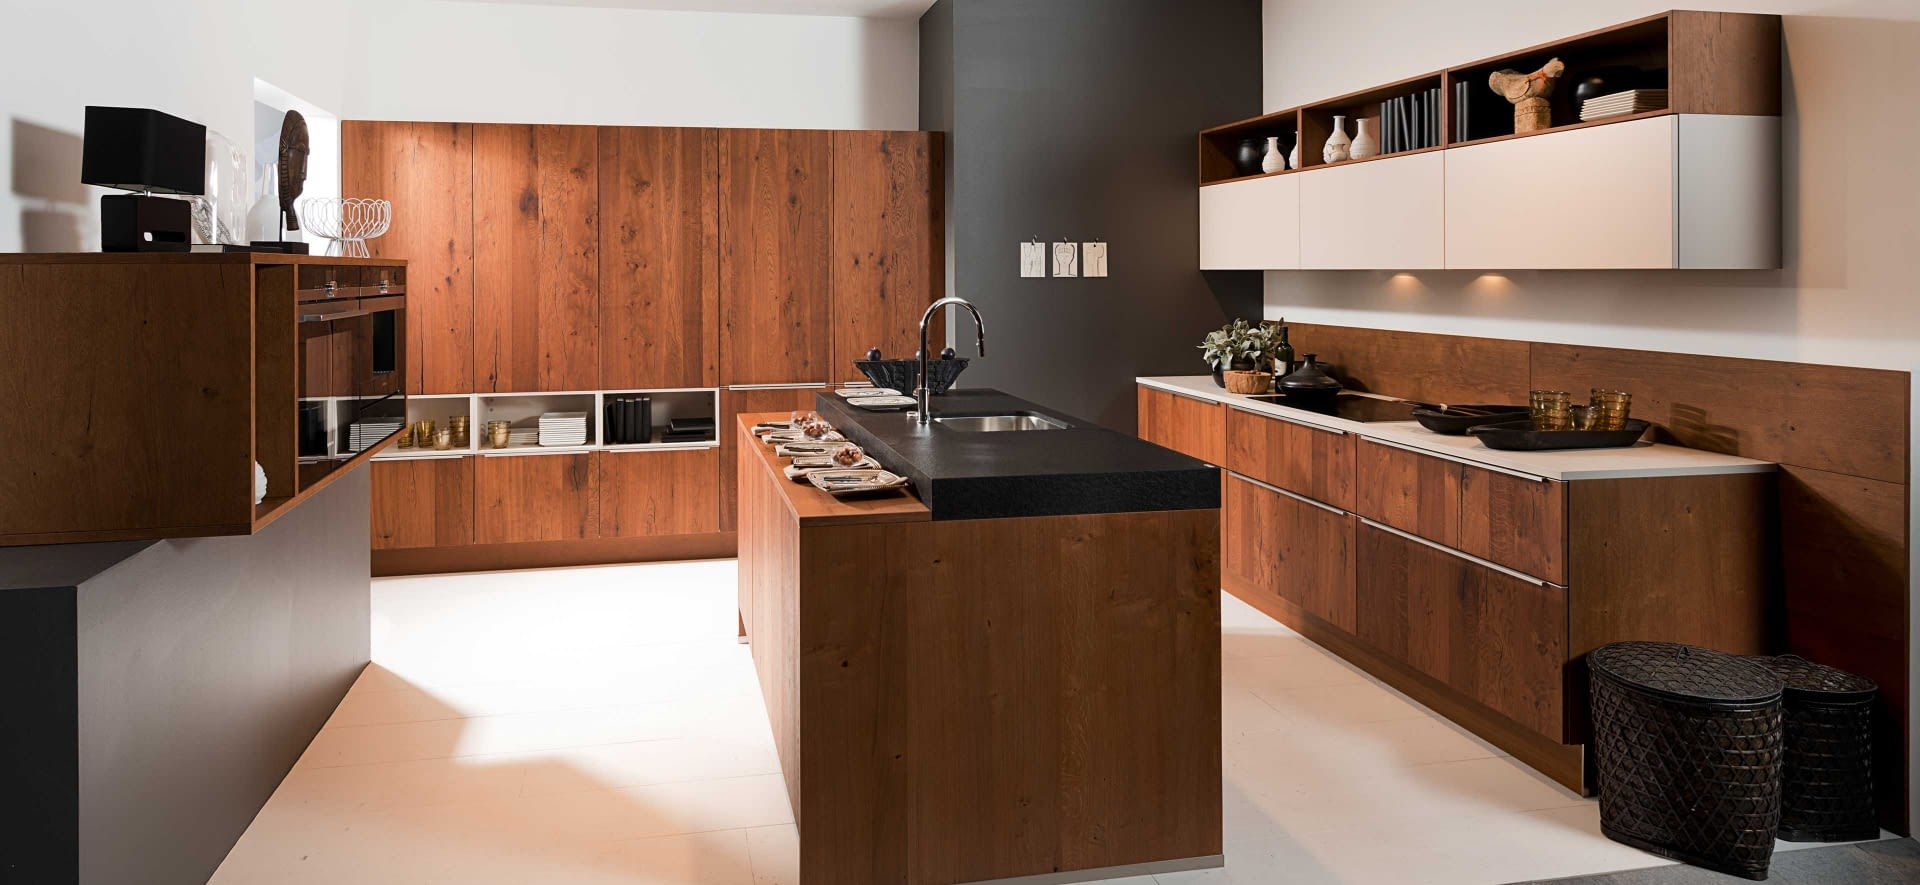 k chenfronten oberfl chen farben marquardt k chen. Black Bedroom Furniture Sets. Home Design Ideas